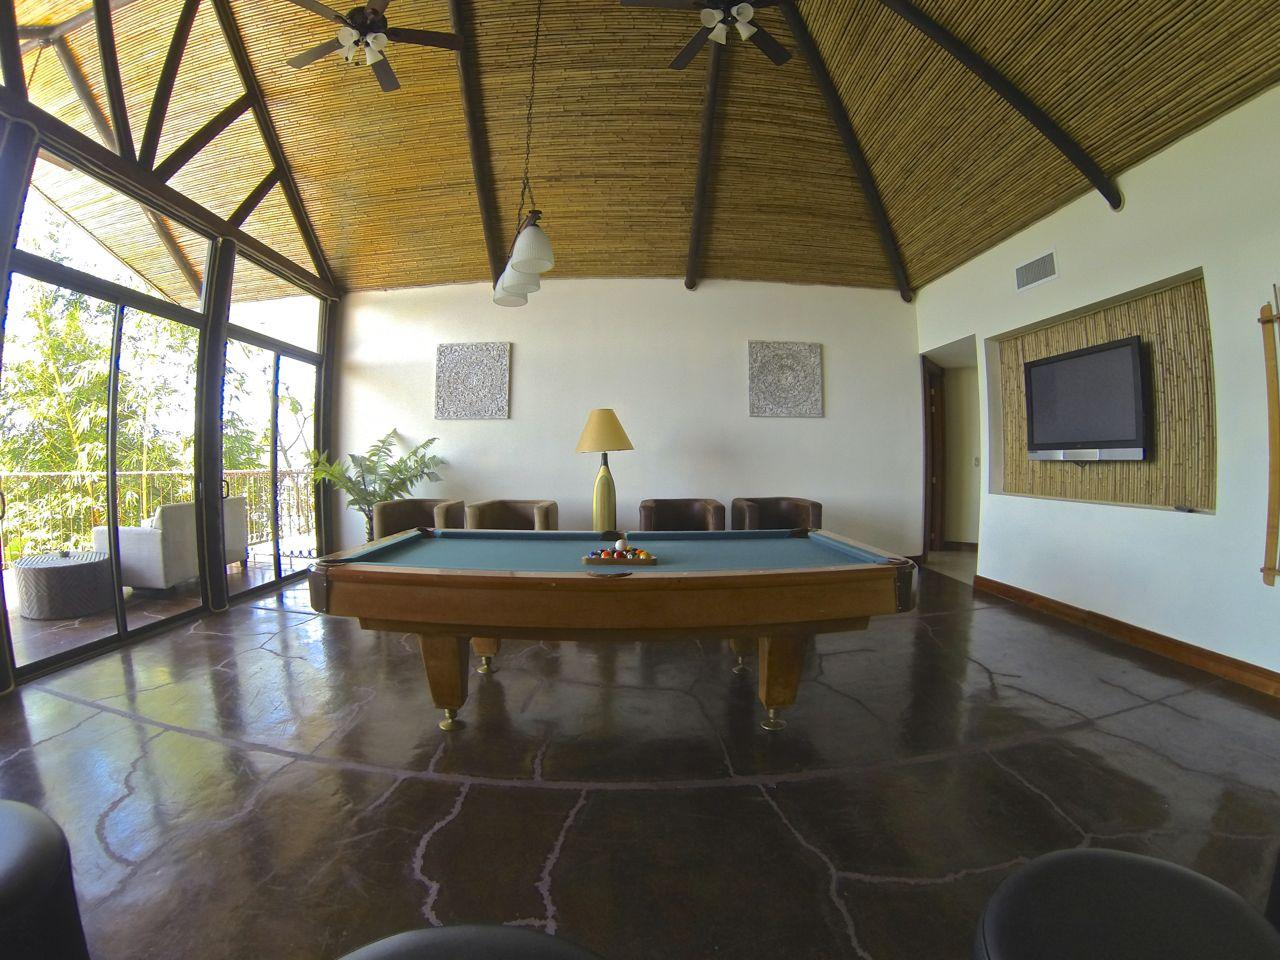 Casa_Pacifica04.jpg